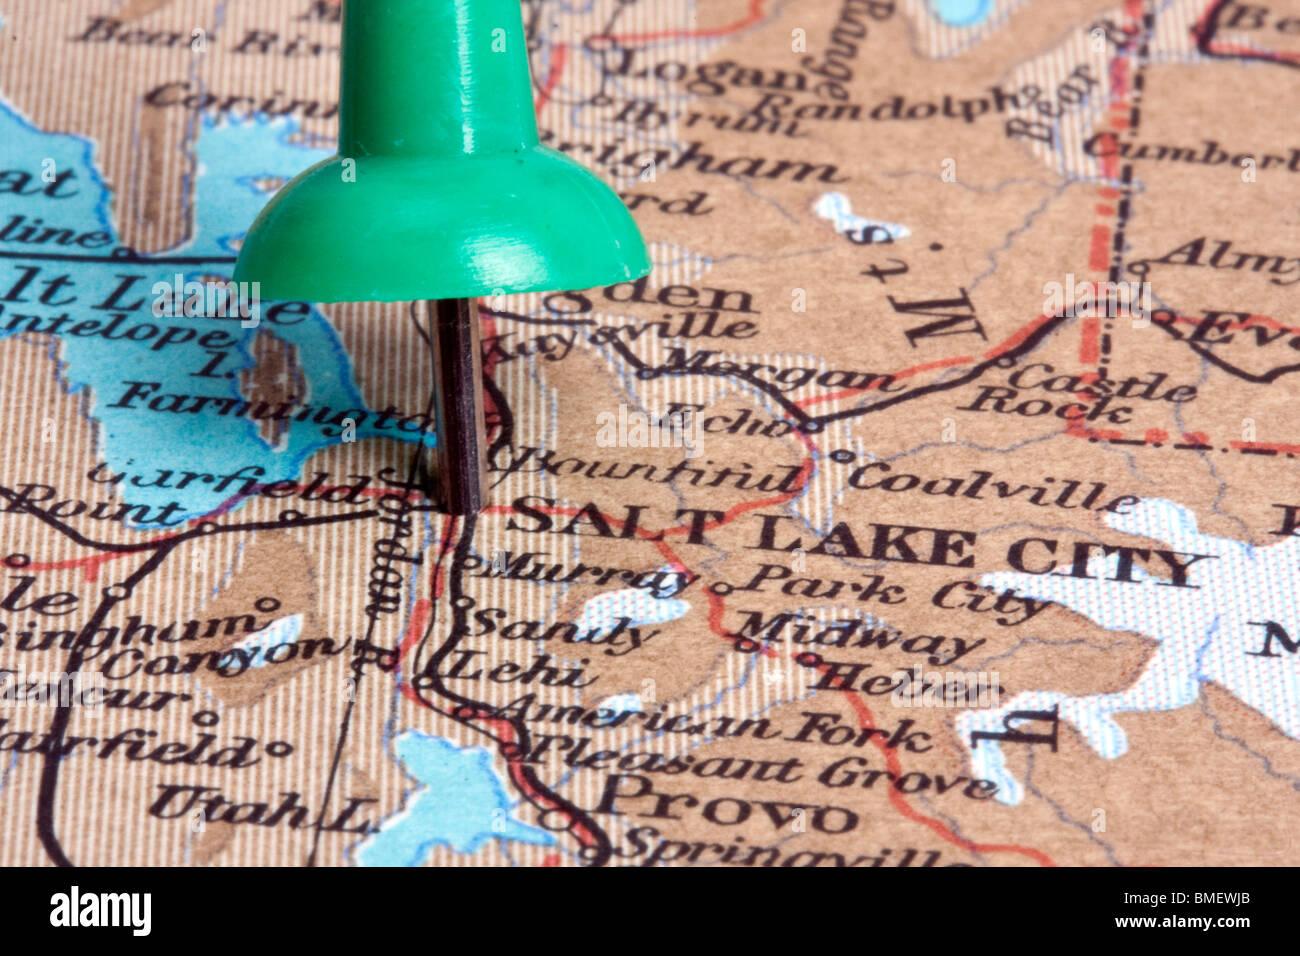 Salt Lake City on map from 1963 Stock Photo: 29830931 - Alamy